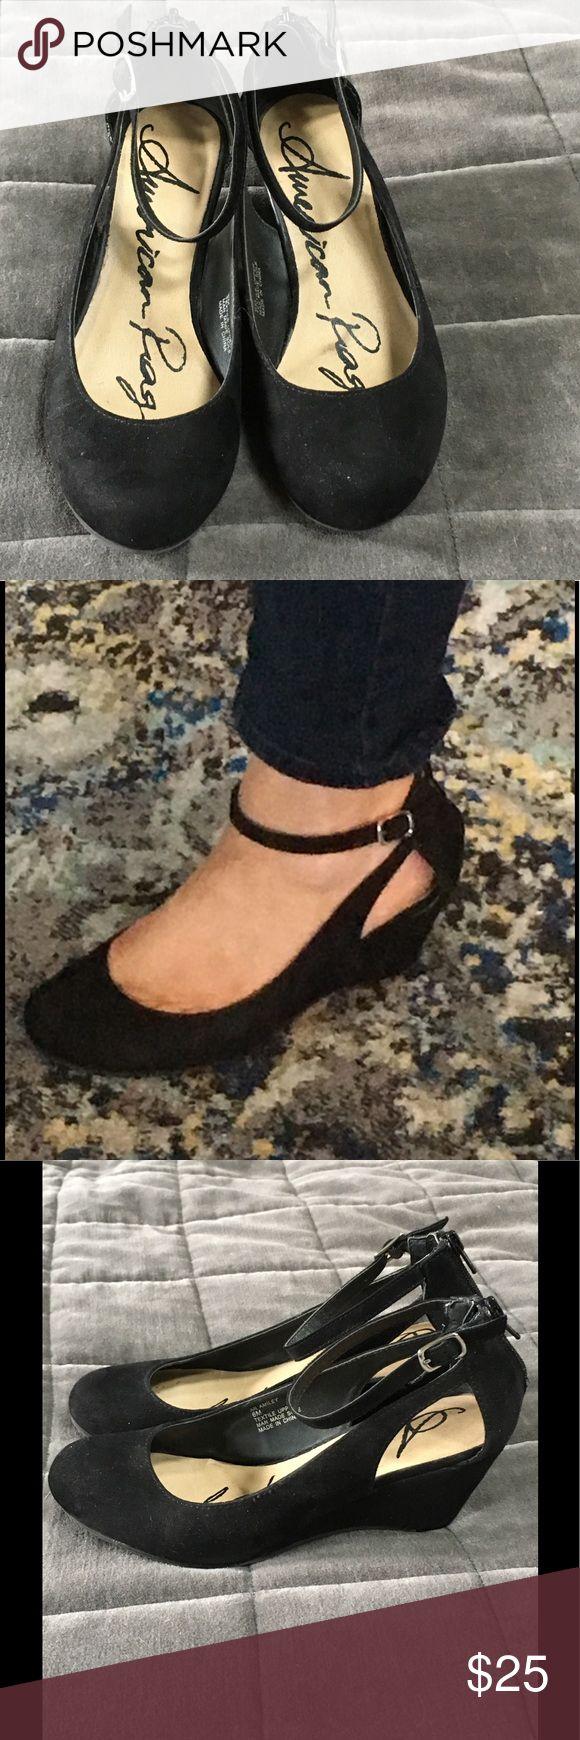 REDUCED! American Rag ankle strap wedges Black suede ankle strap wedges, like new American Rag Shoes Wedges